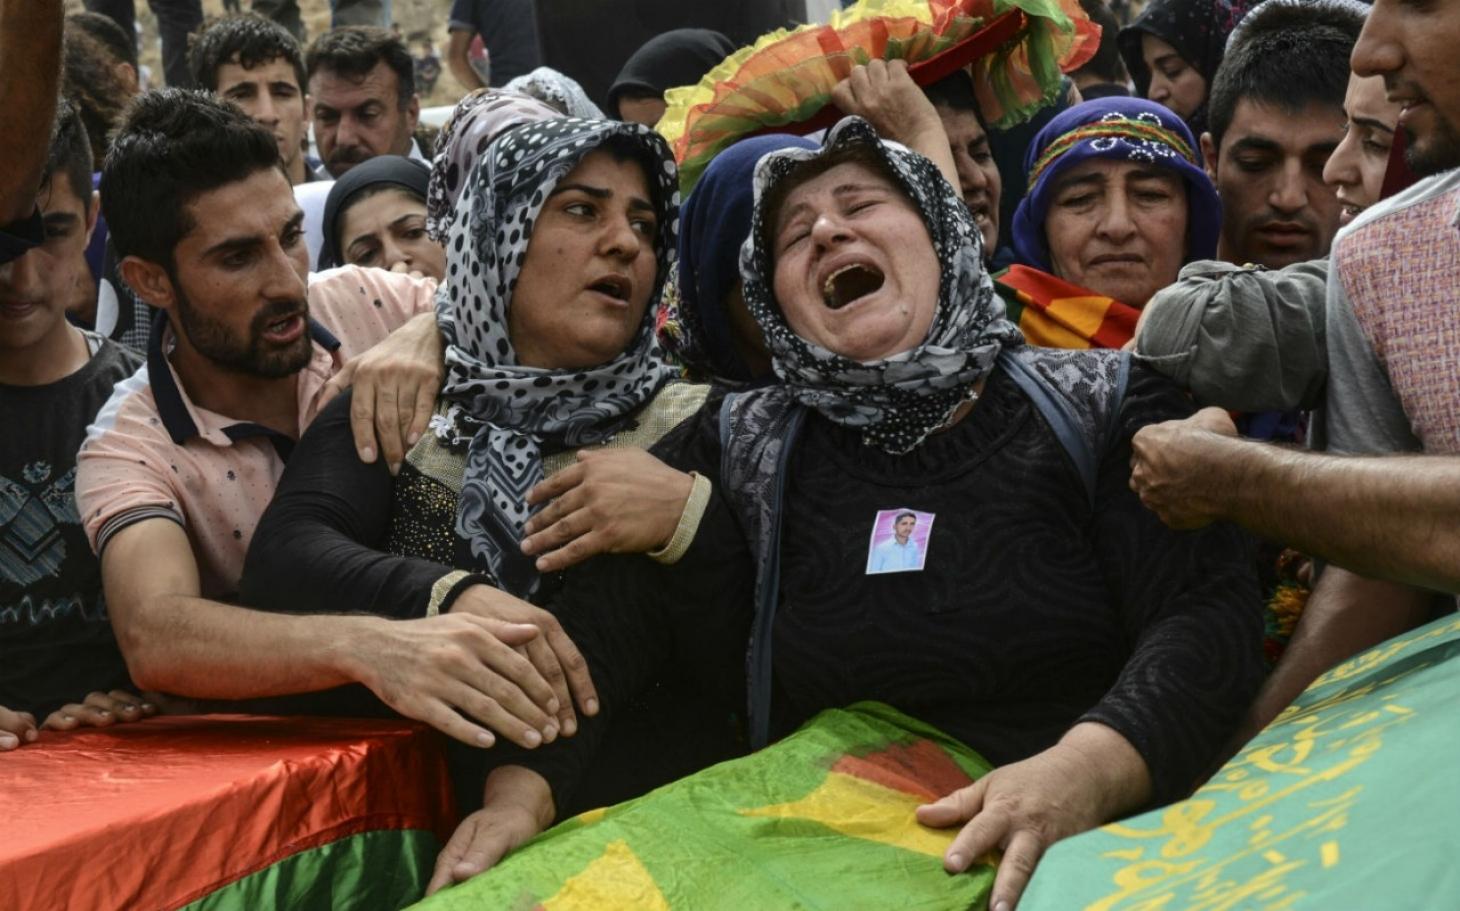 Who killed the Turks 15